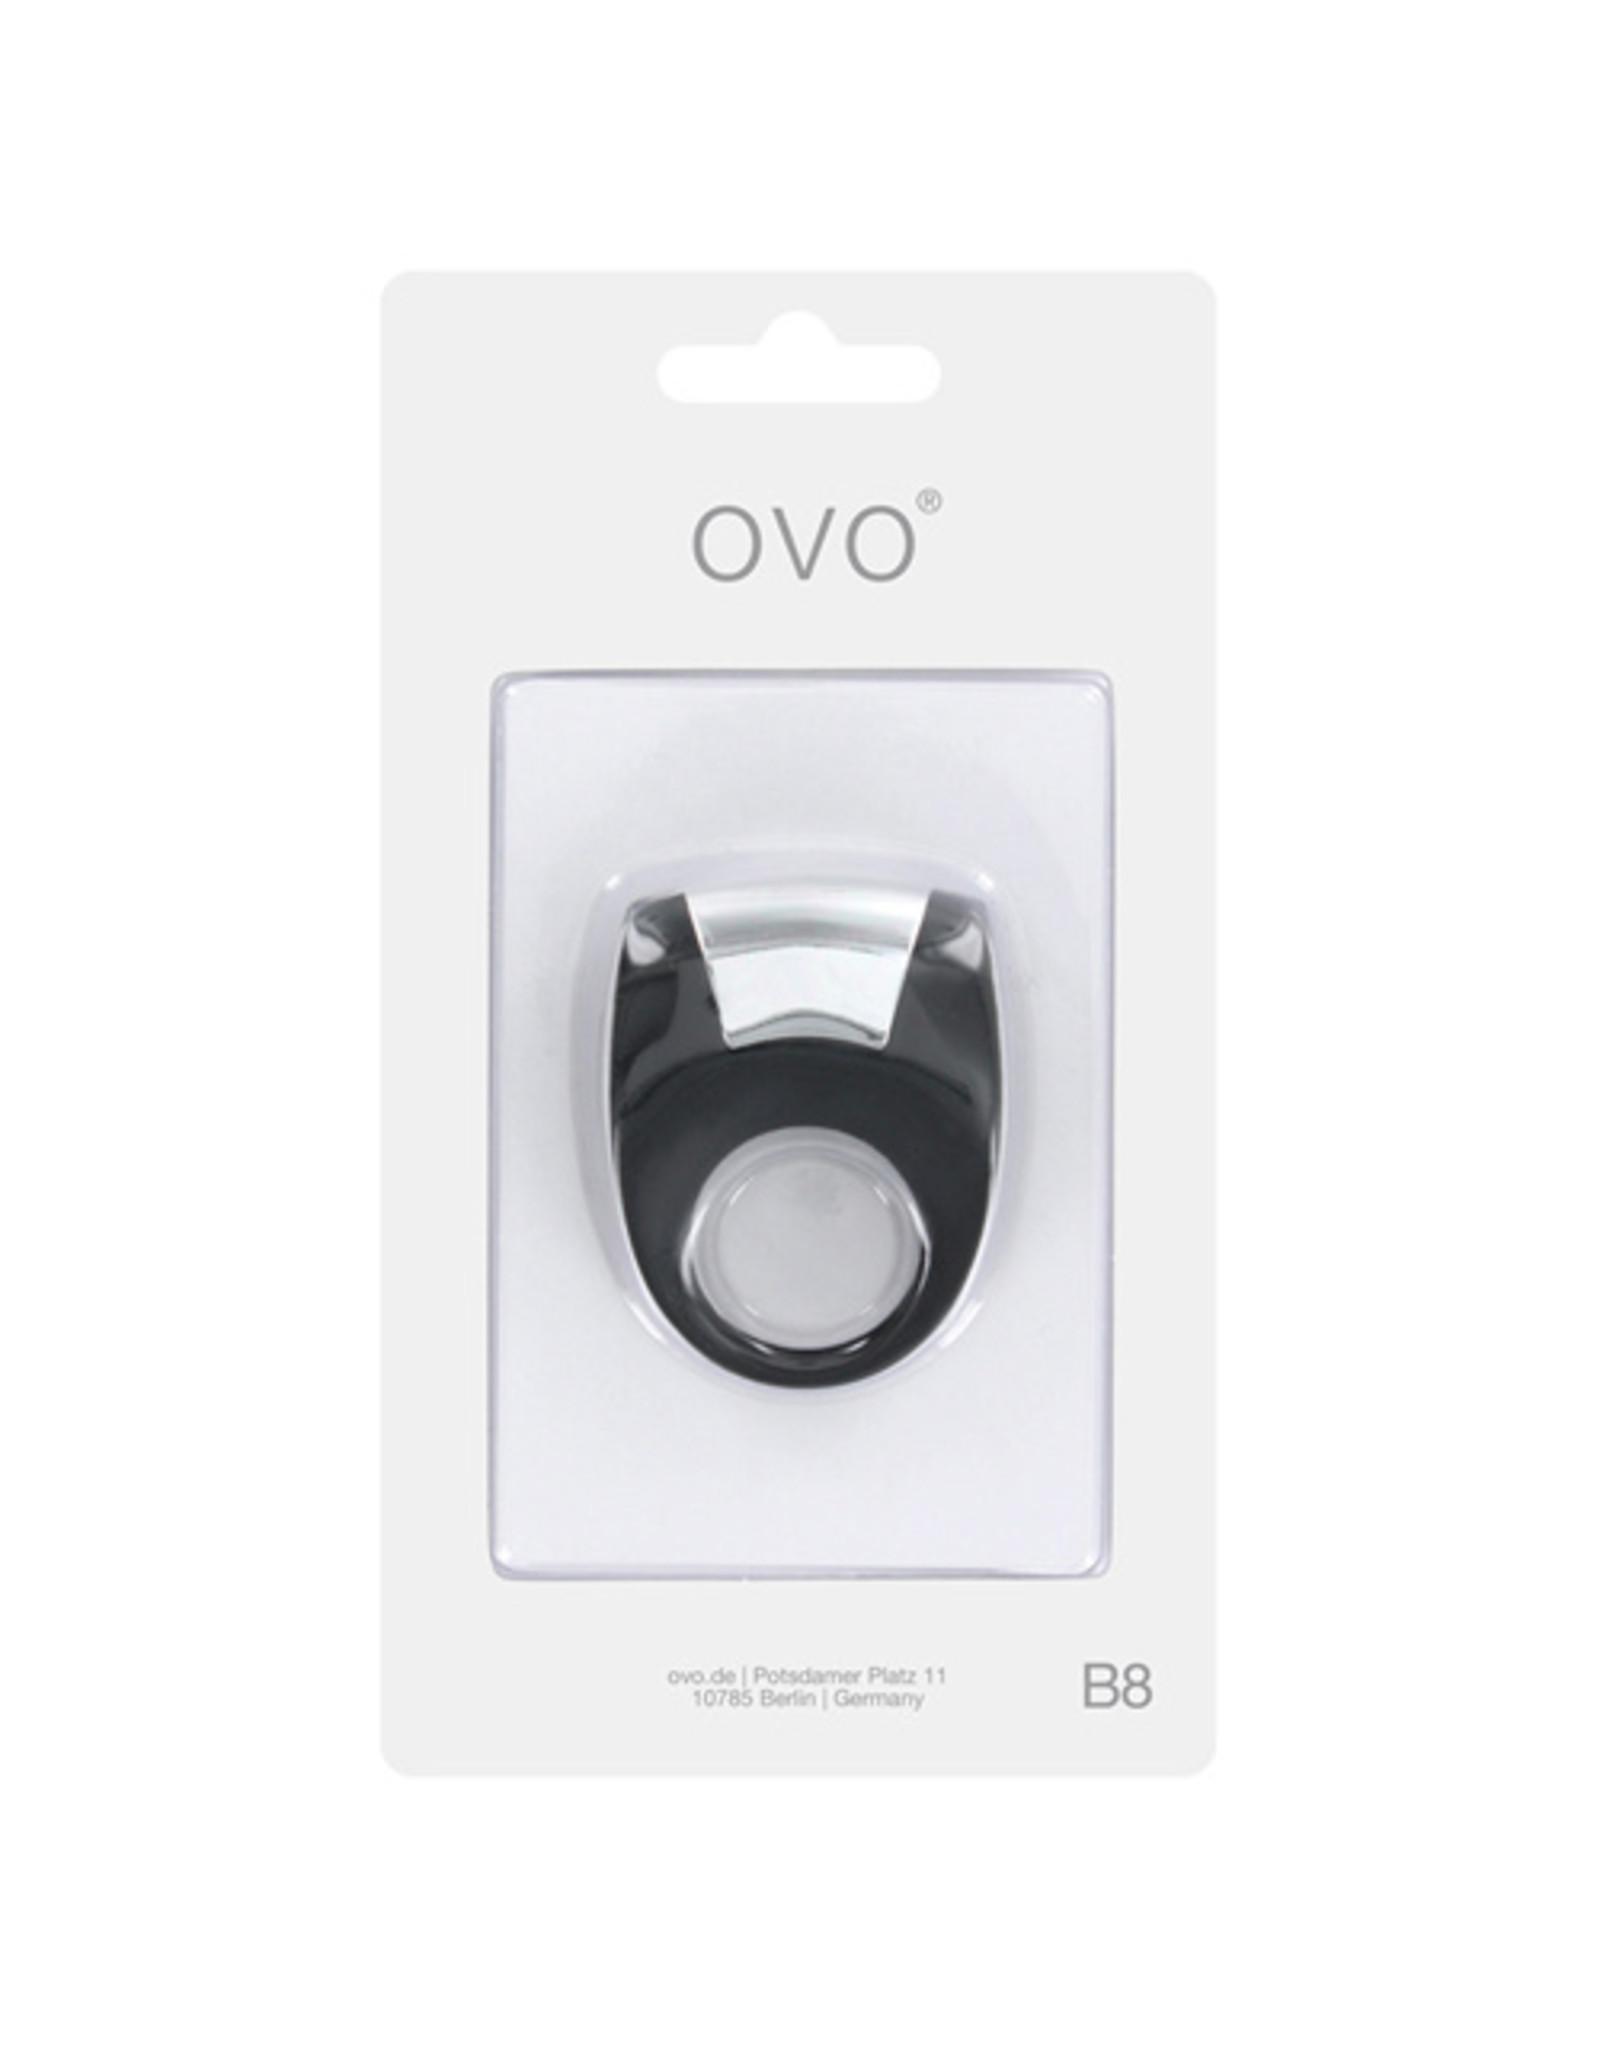 Ovo Ovo B8 Vibrerende penis ring - Zwart